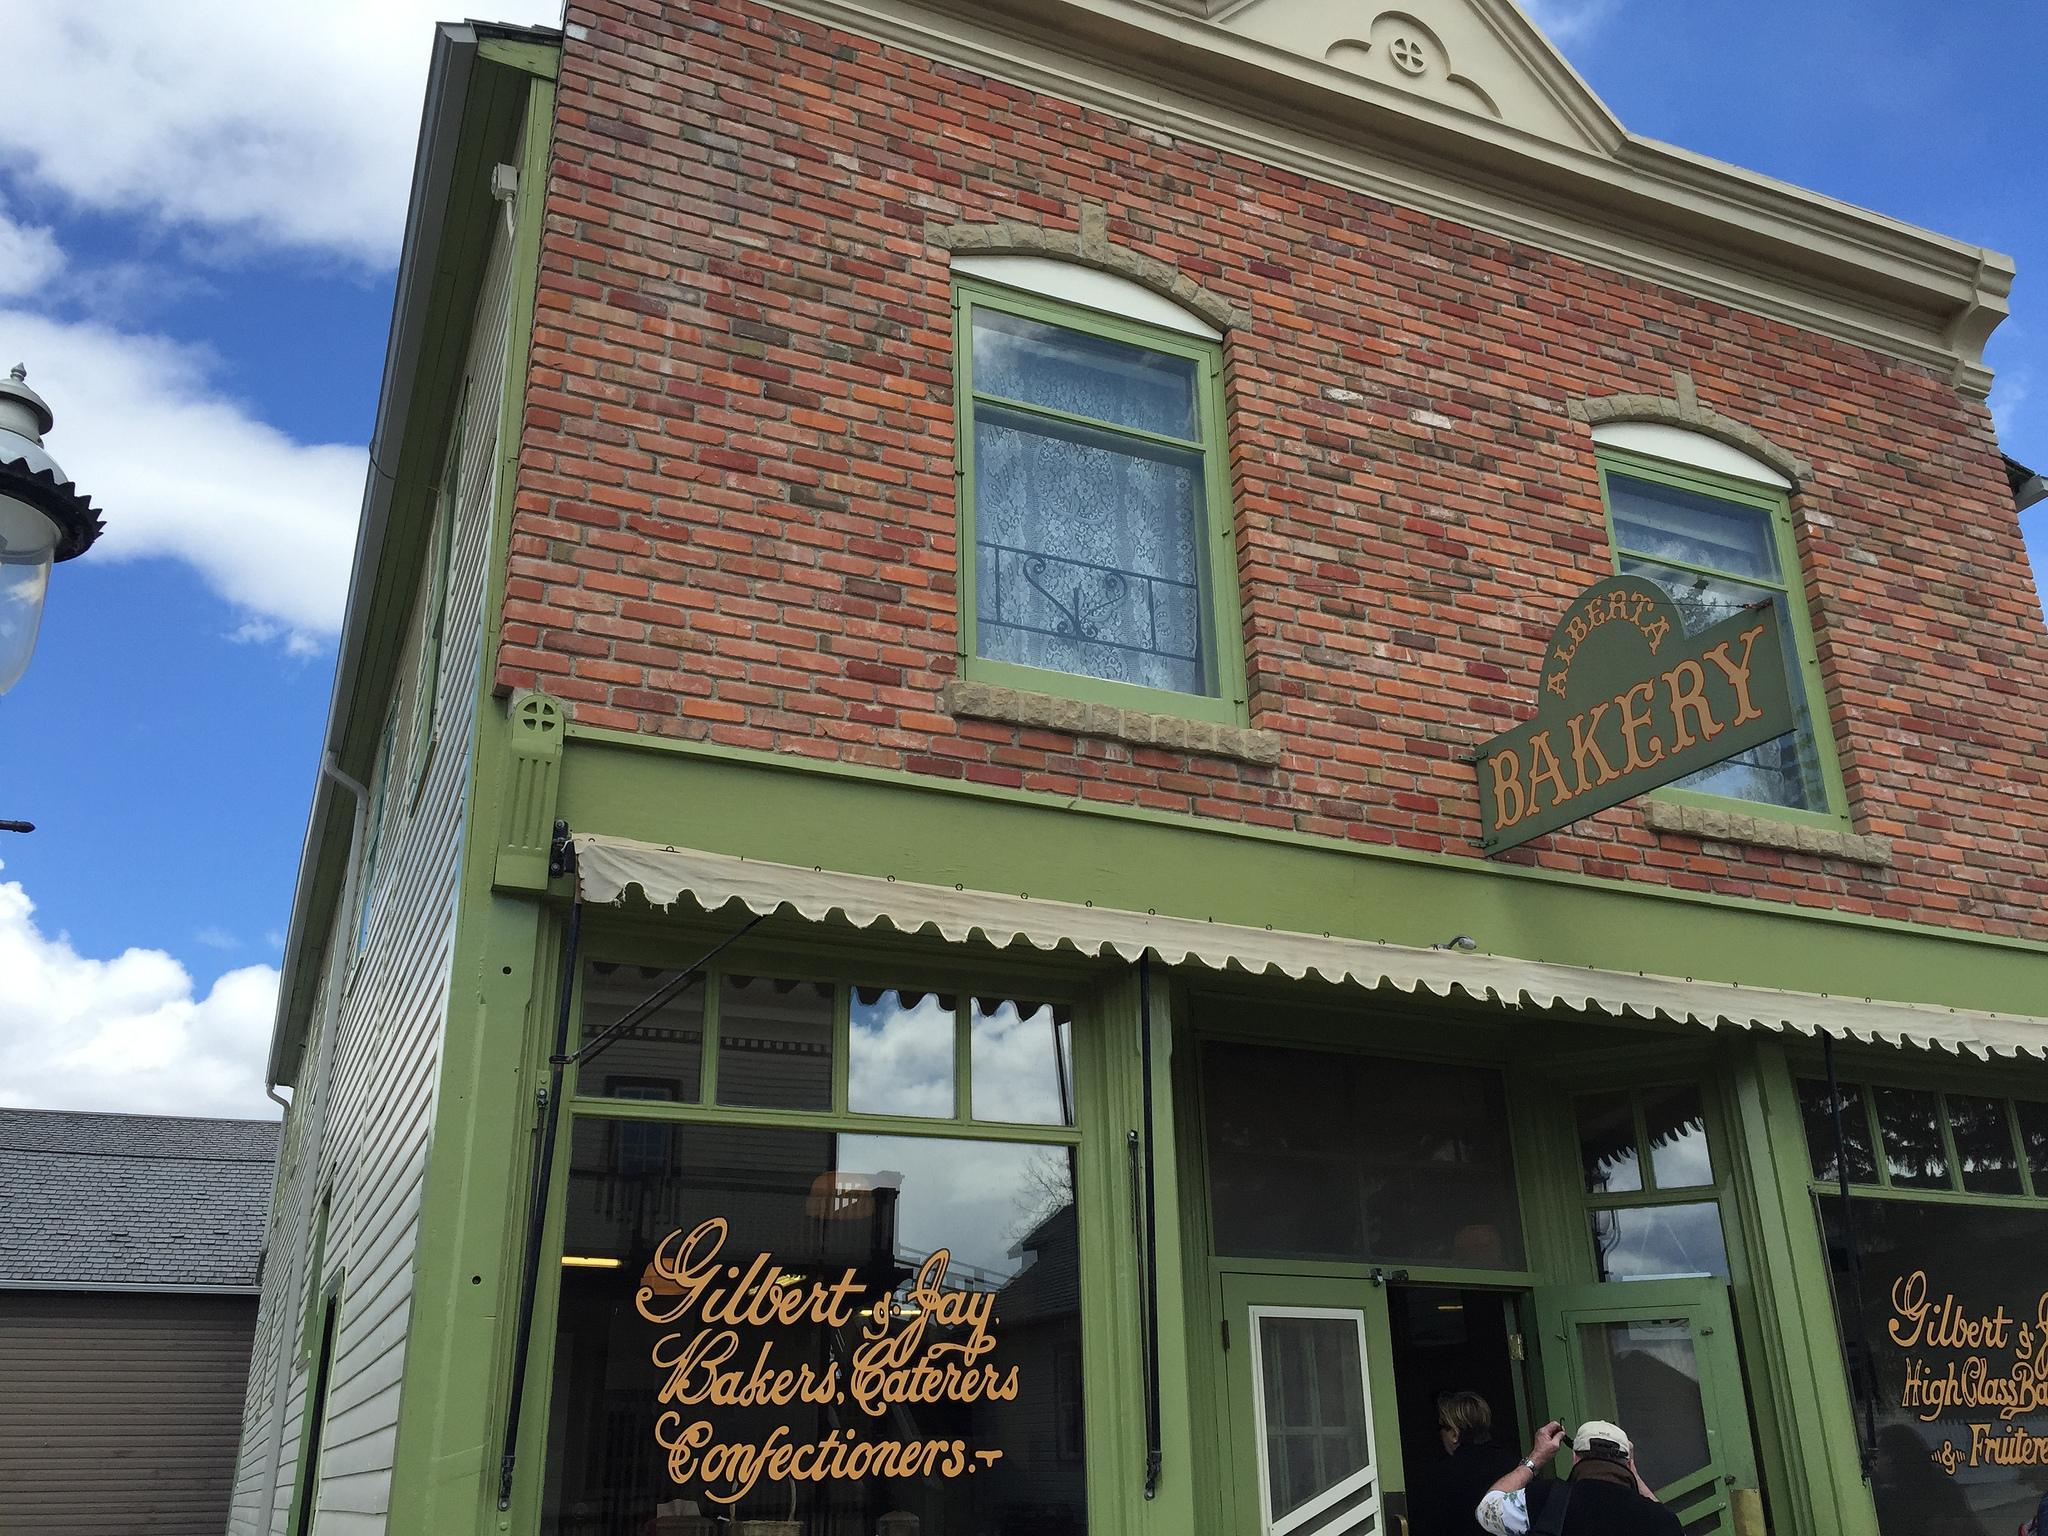 Heritage Park Bakery